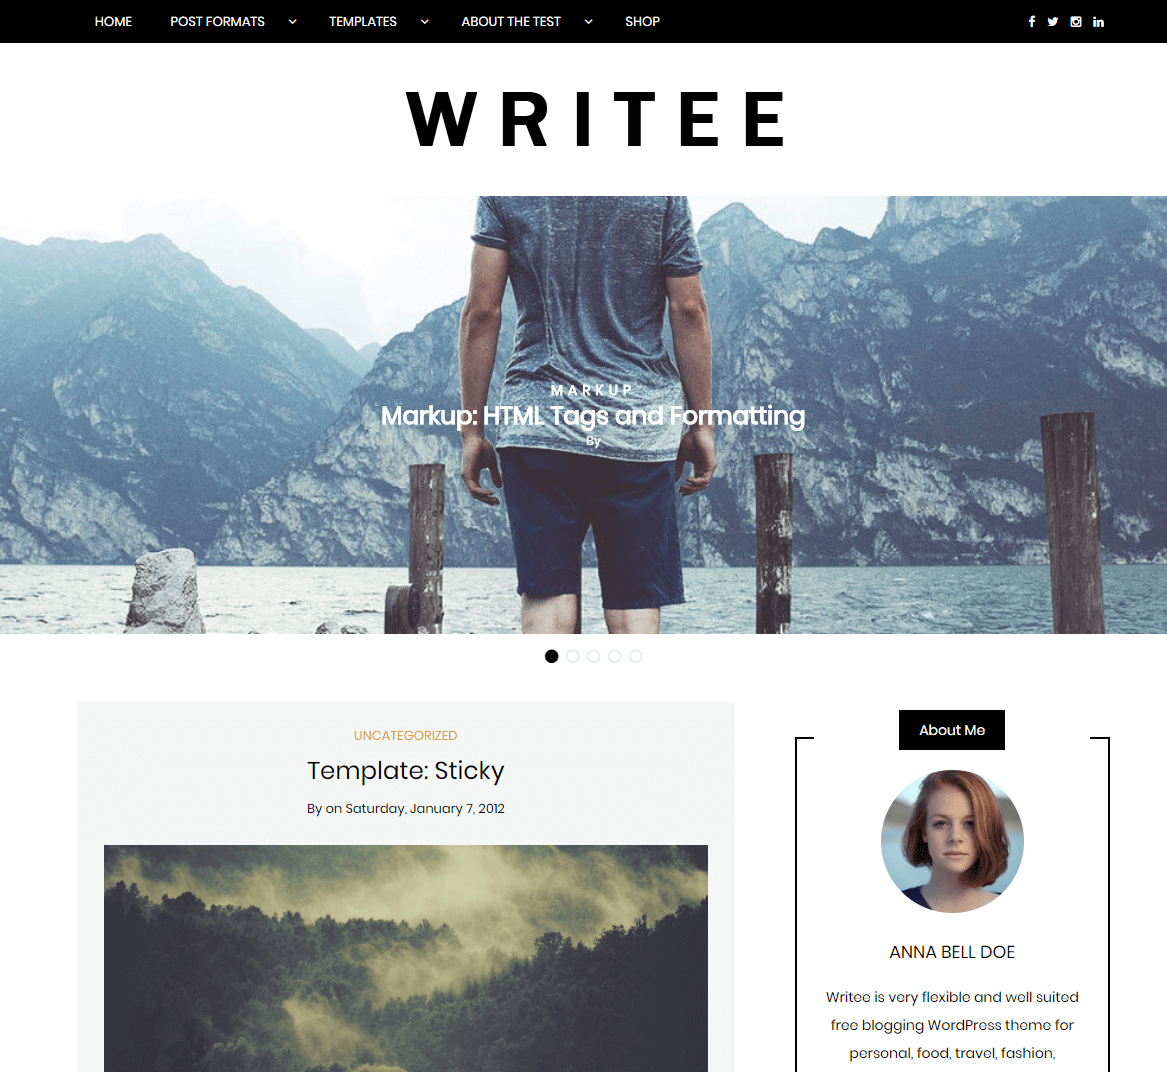 Writee is a free WordPress theme for a blog